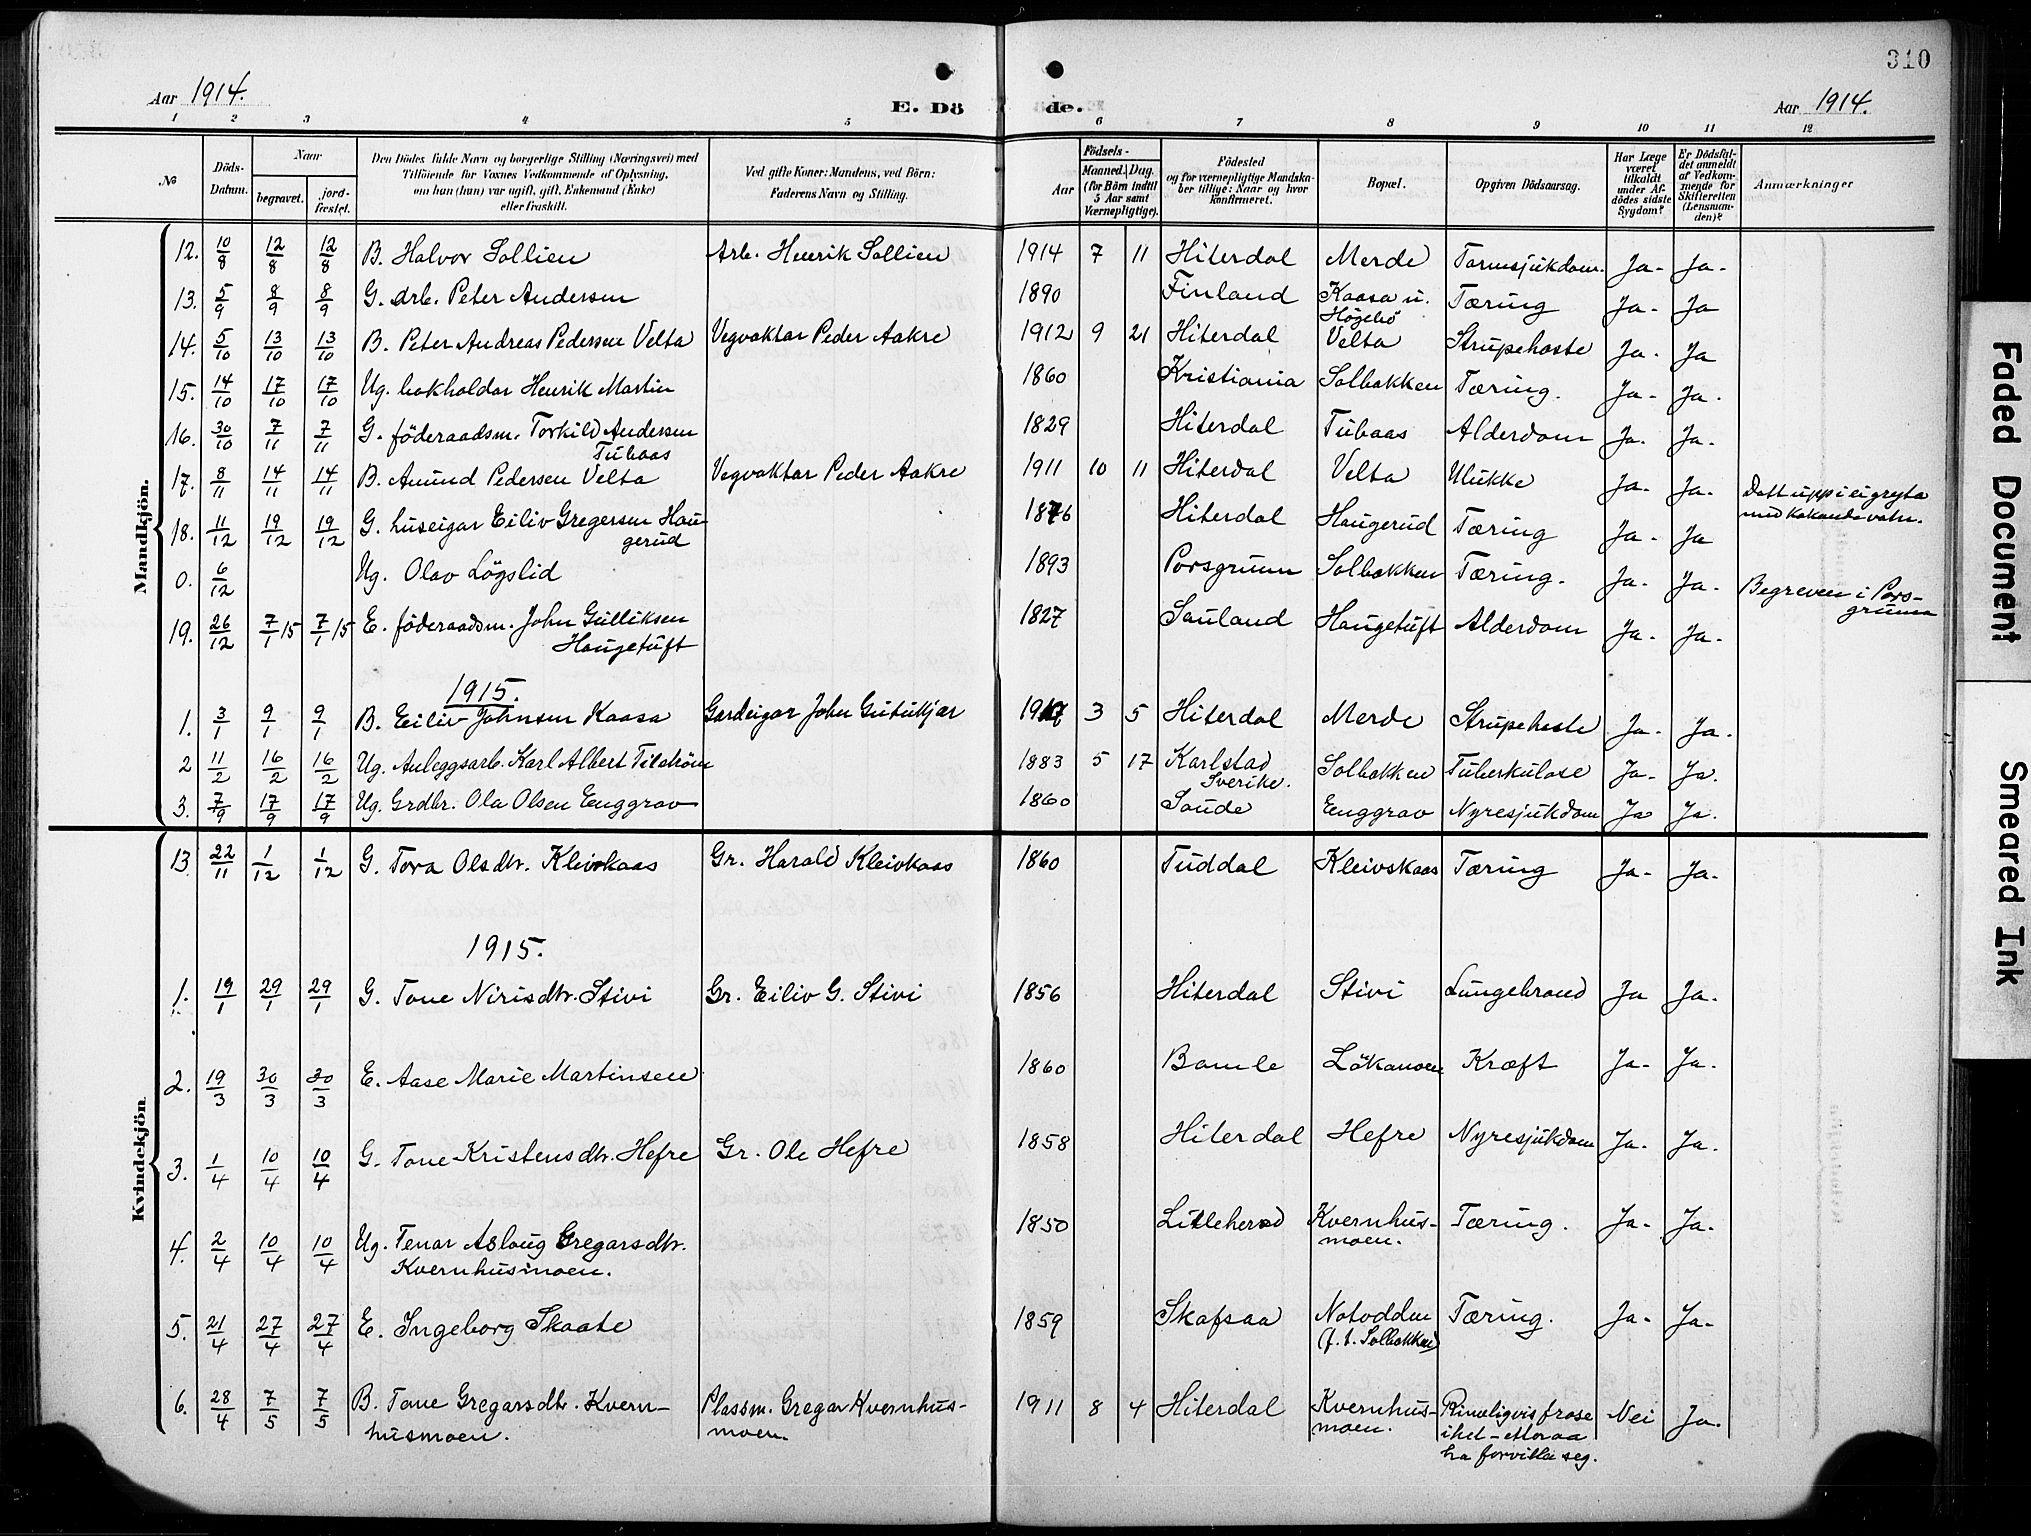 SAKO, Heddal kirkebøker, G/Ga/L0003: Klokkerbok nr. I 3, 1908-1932, s. 310